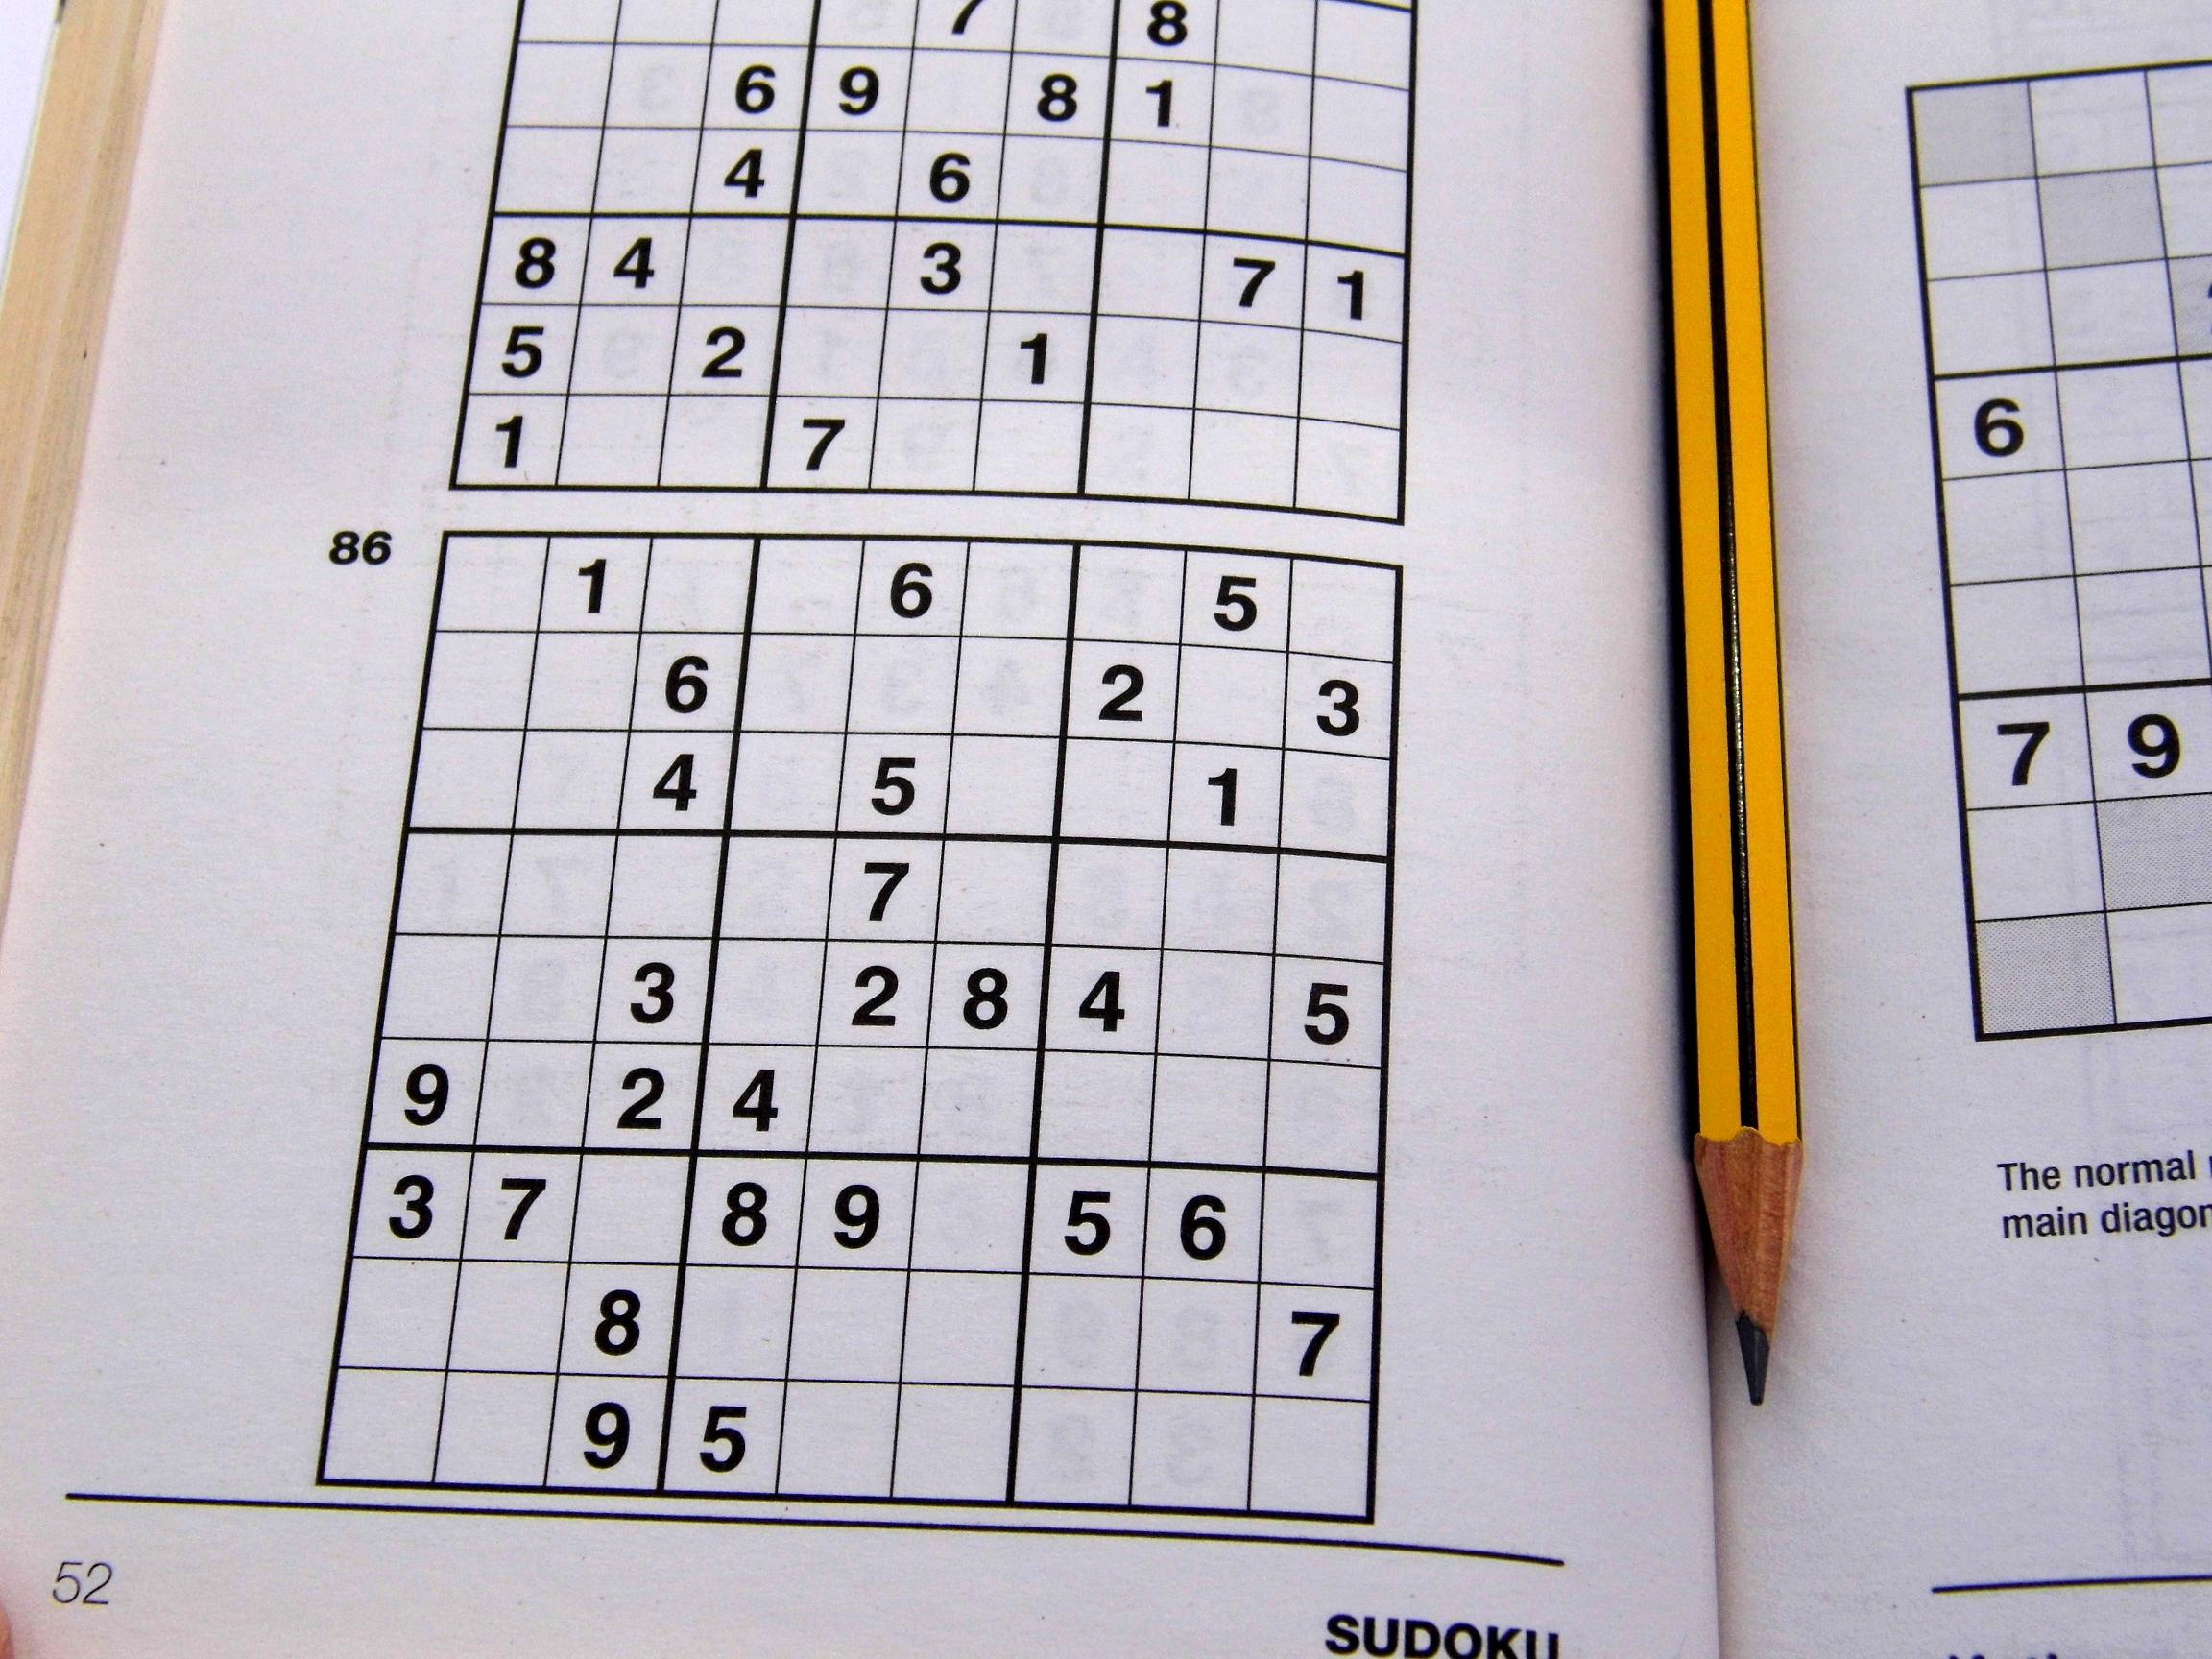 Medium Printable Sudoku Puzzles 6 Per Page – Book 1 – Free Sudoku - Printable Sudoku Puzzles One Per Page